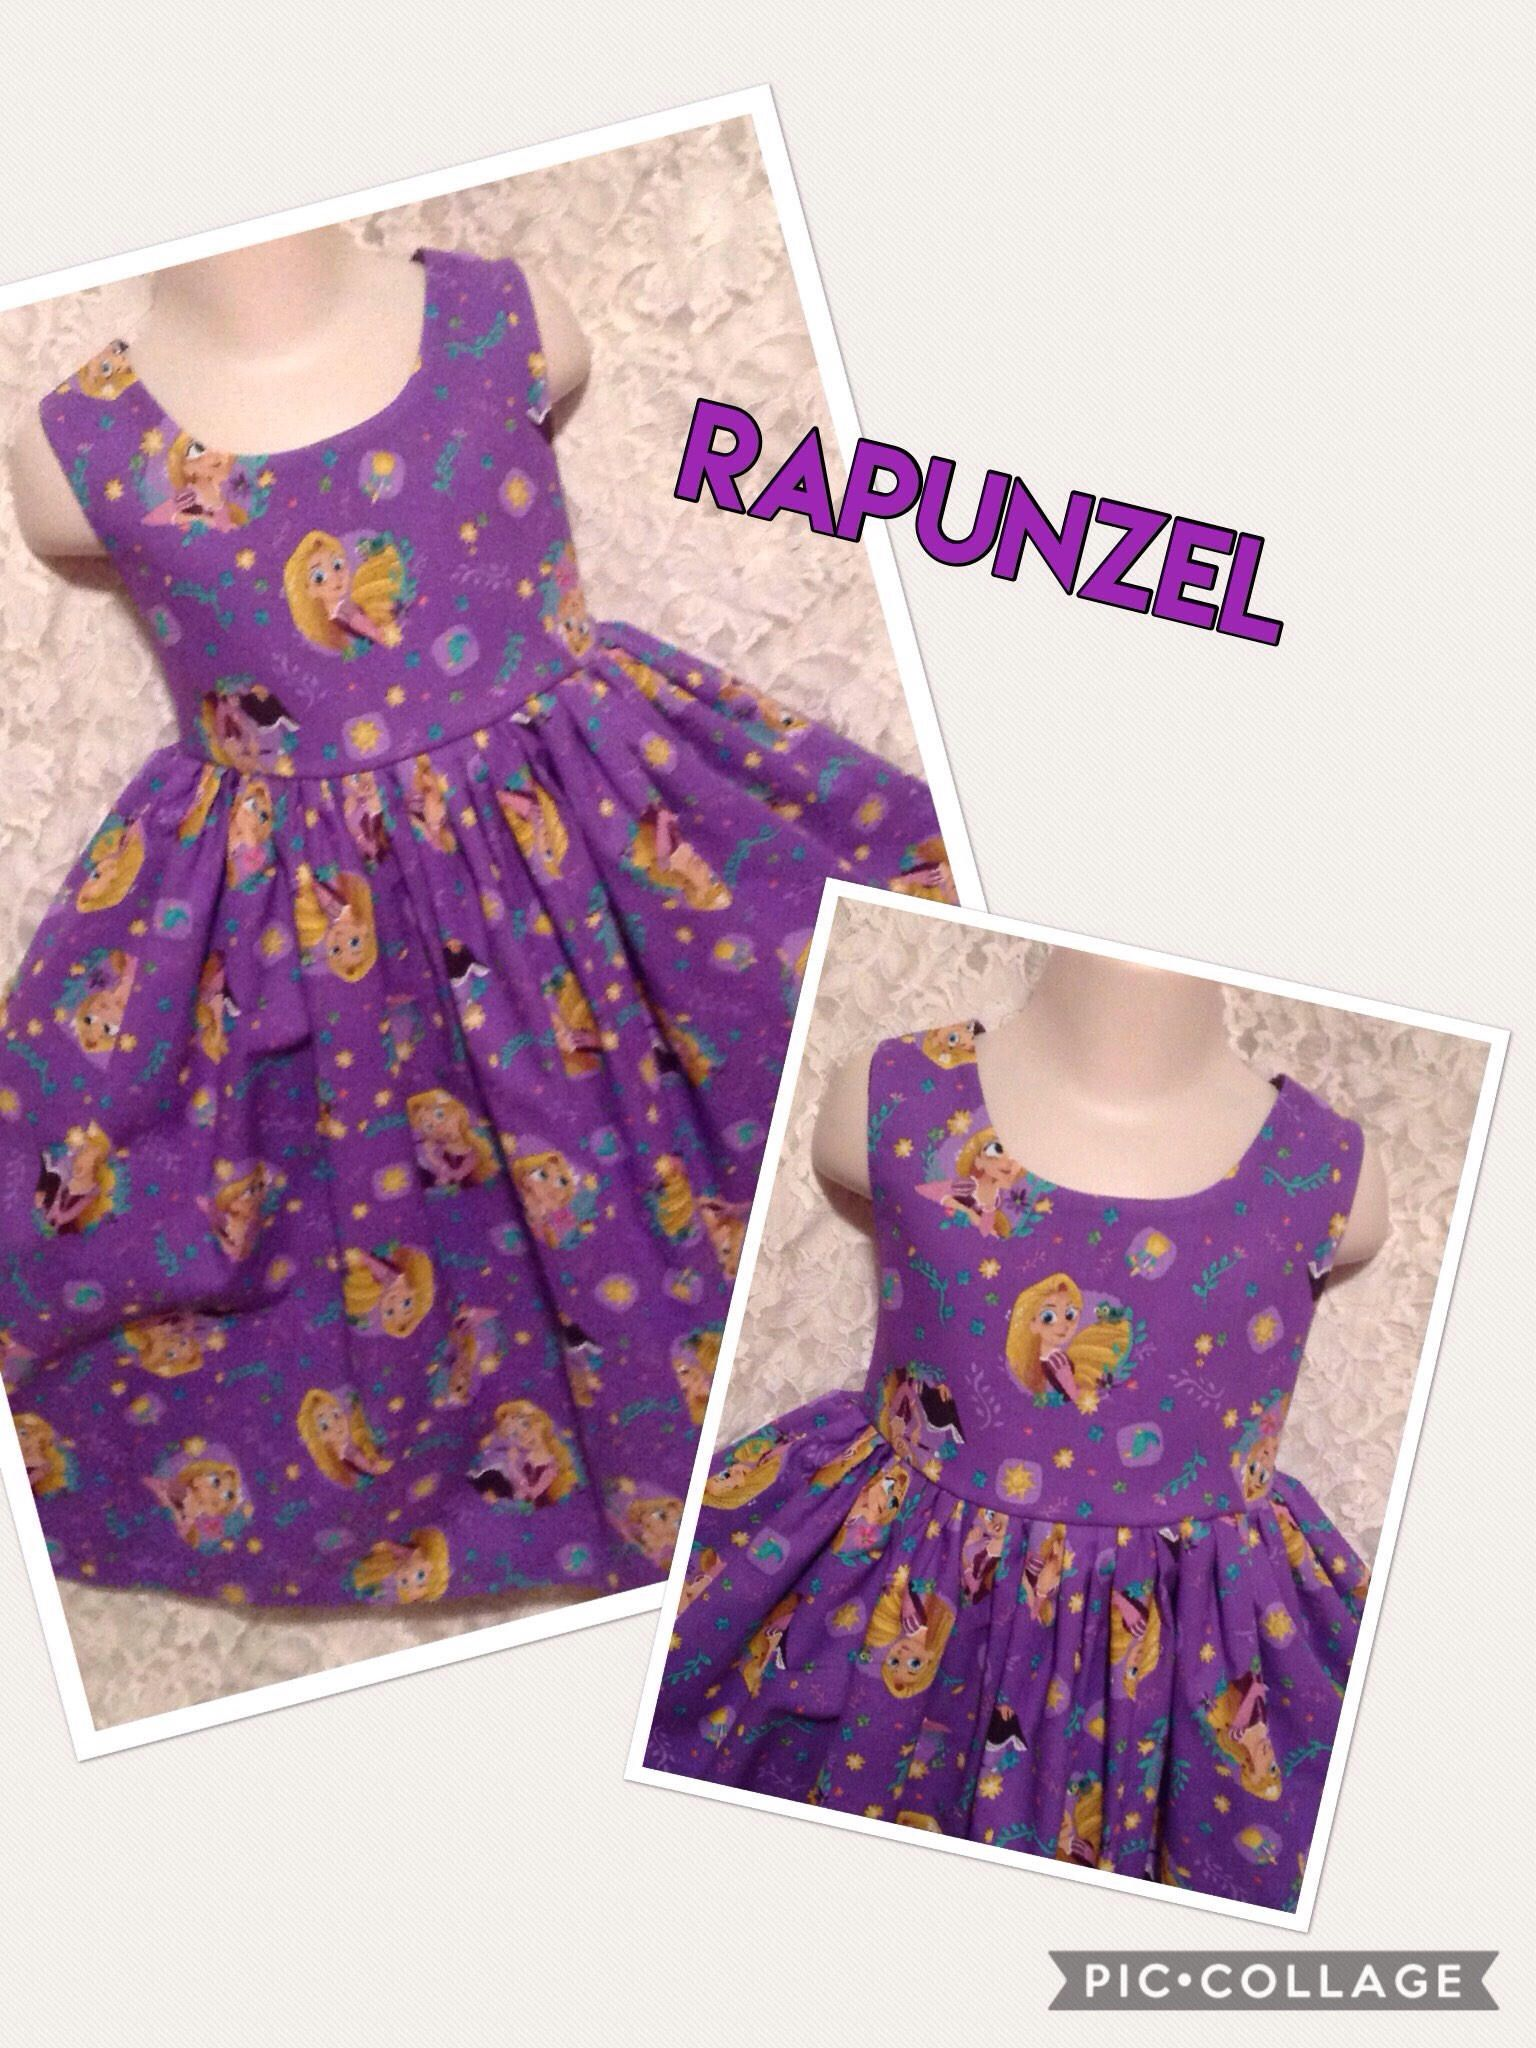 Tangled Rapunzel * Disney classic jumper style dress